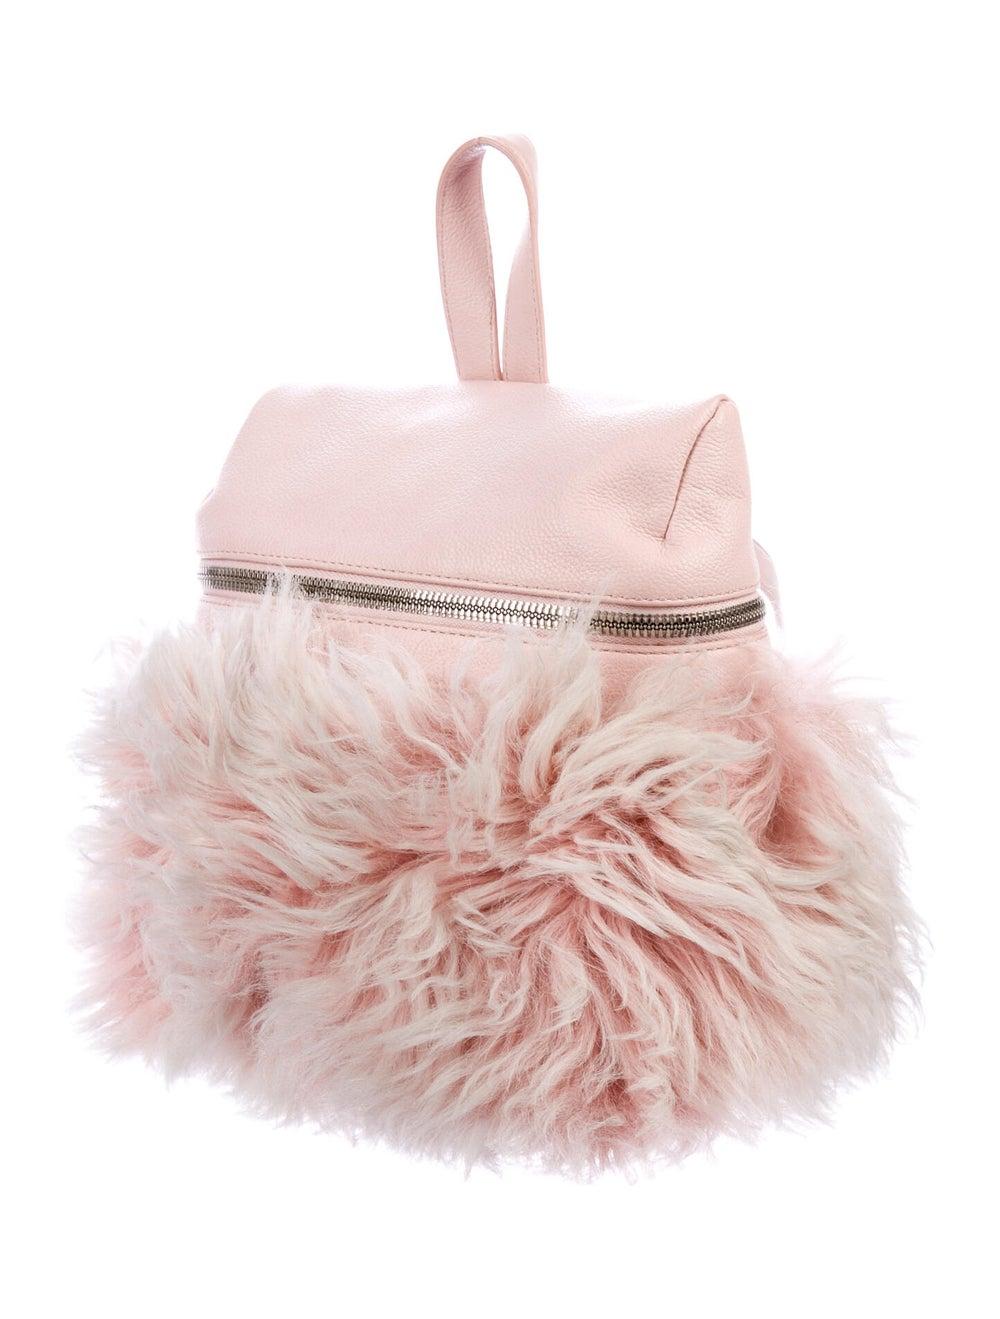 Kara Grained Leather Backpack Pink - image 3